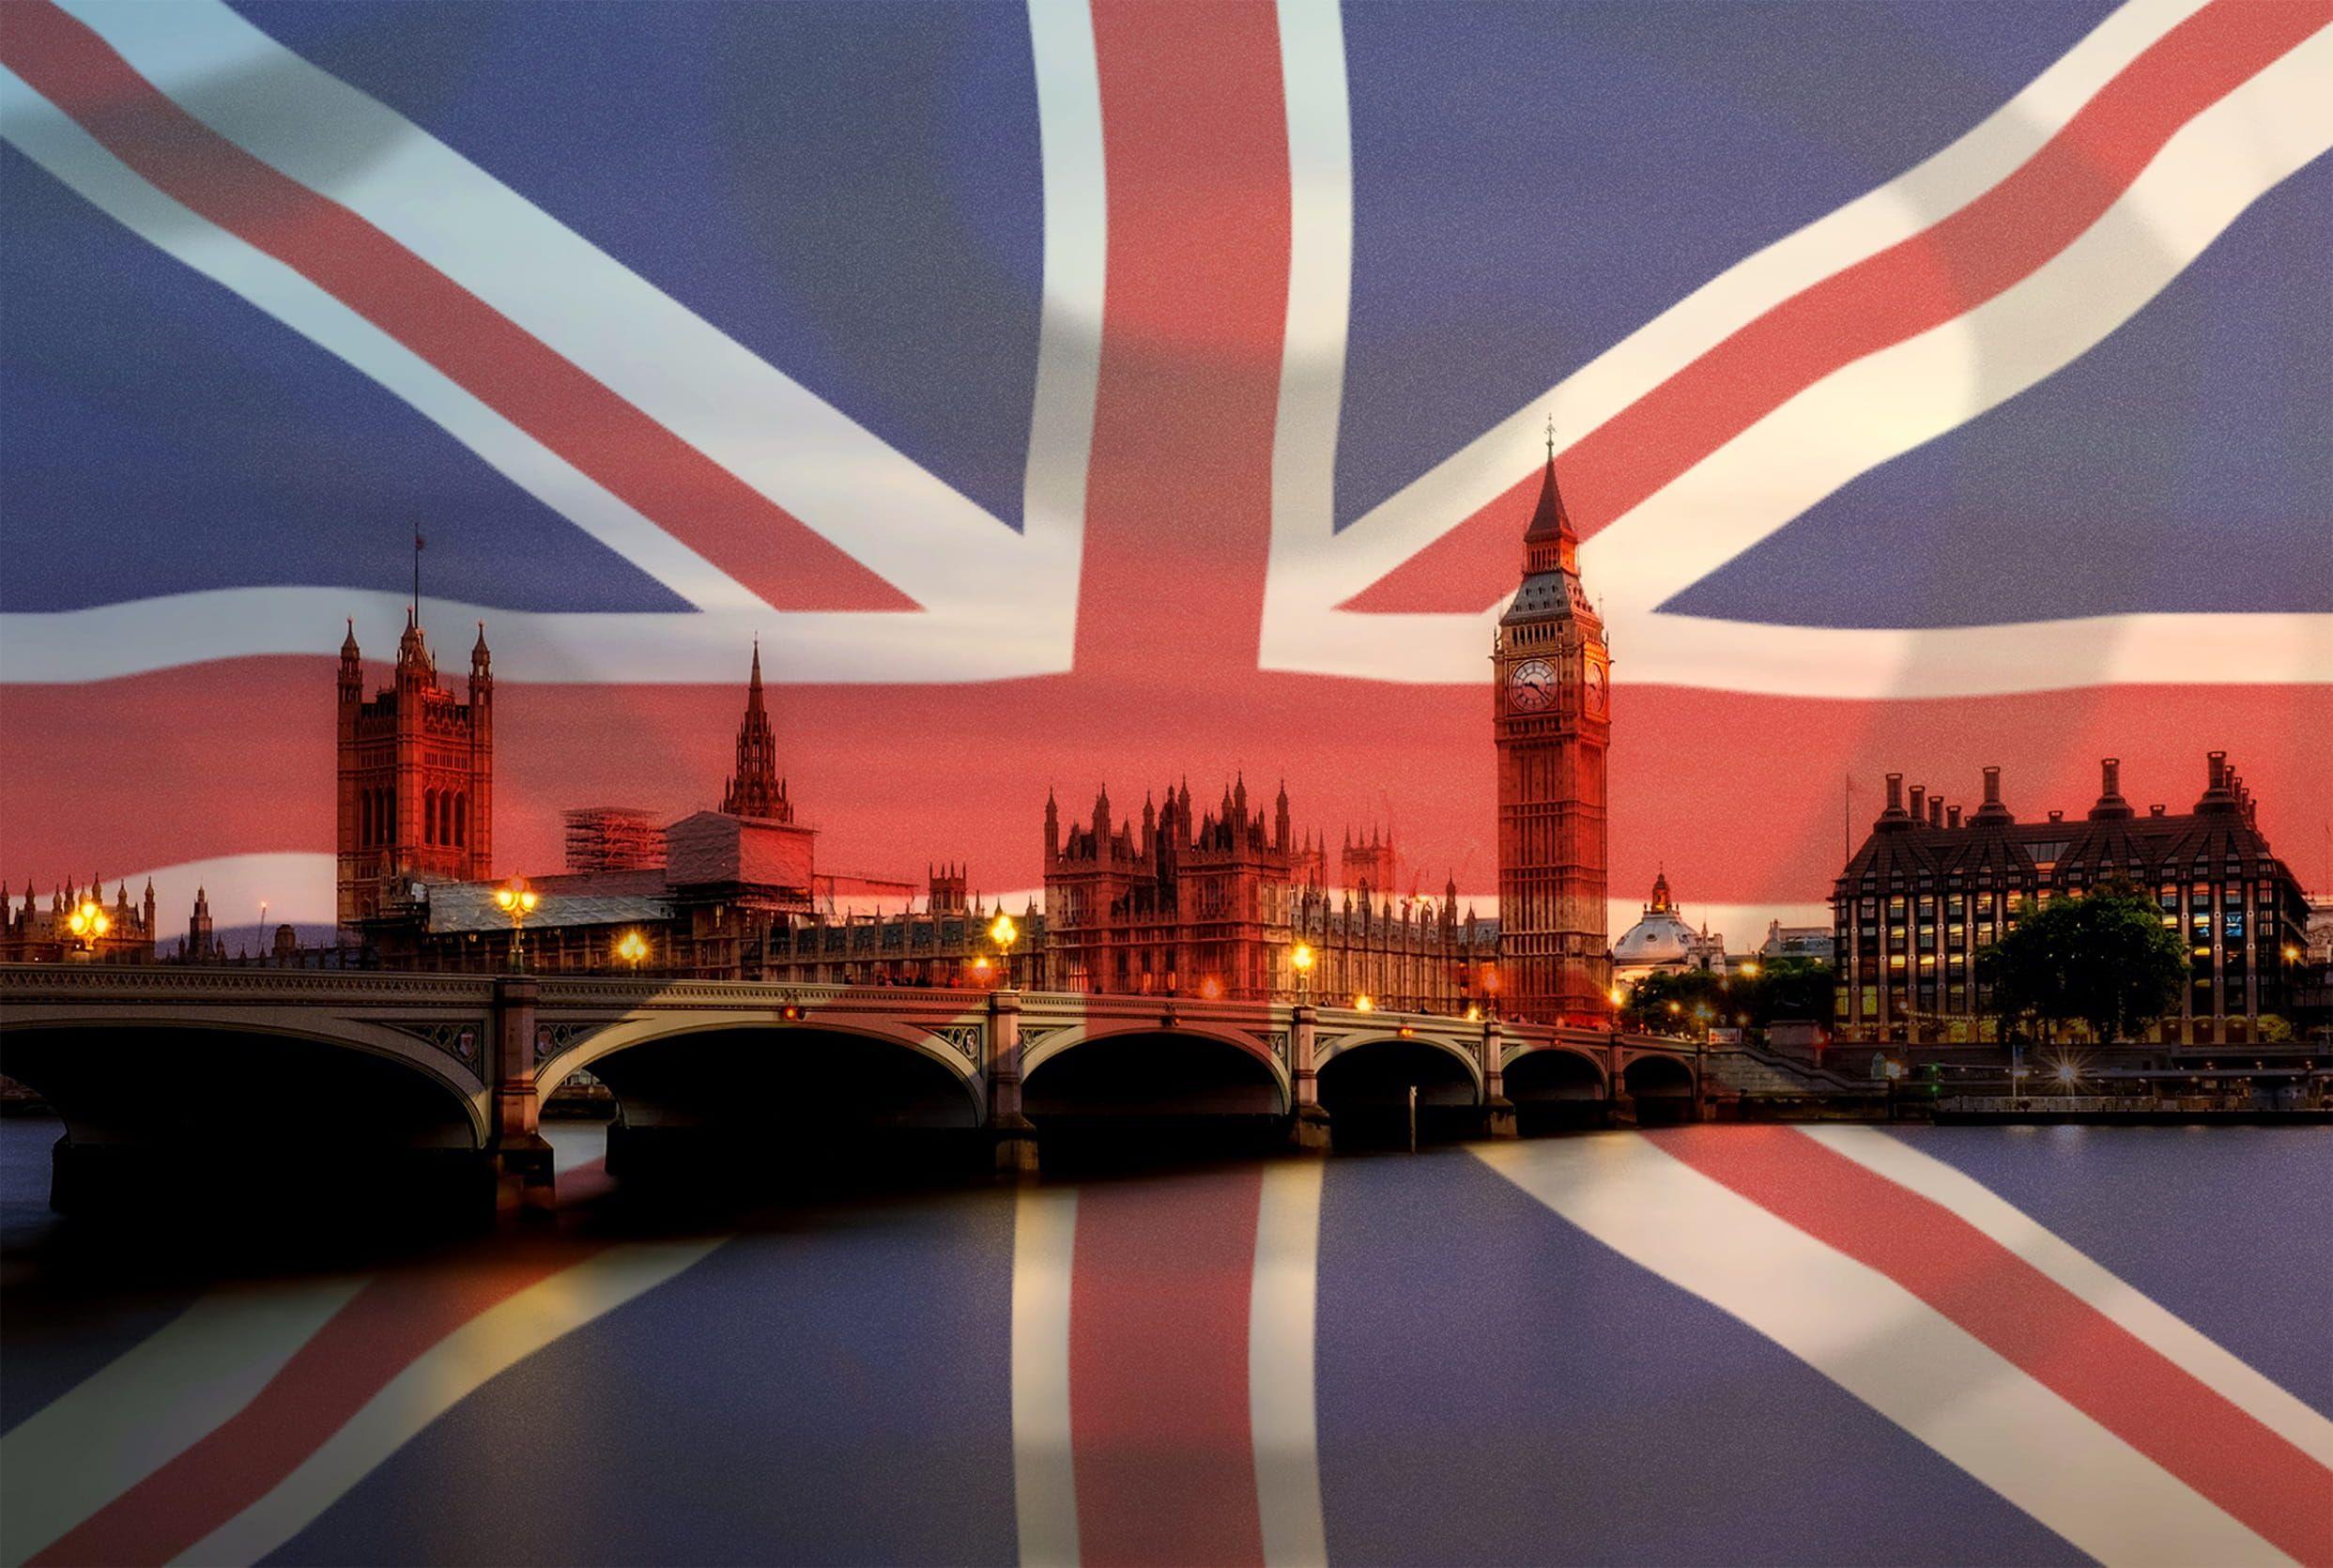 тайну флаг лондона фото записи видео